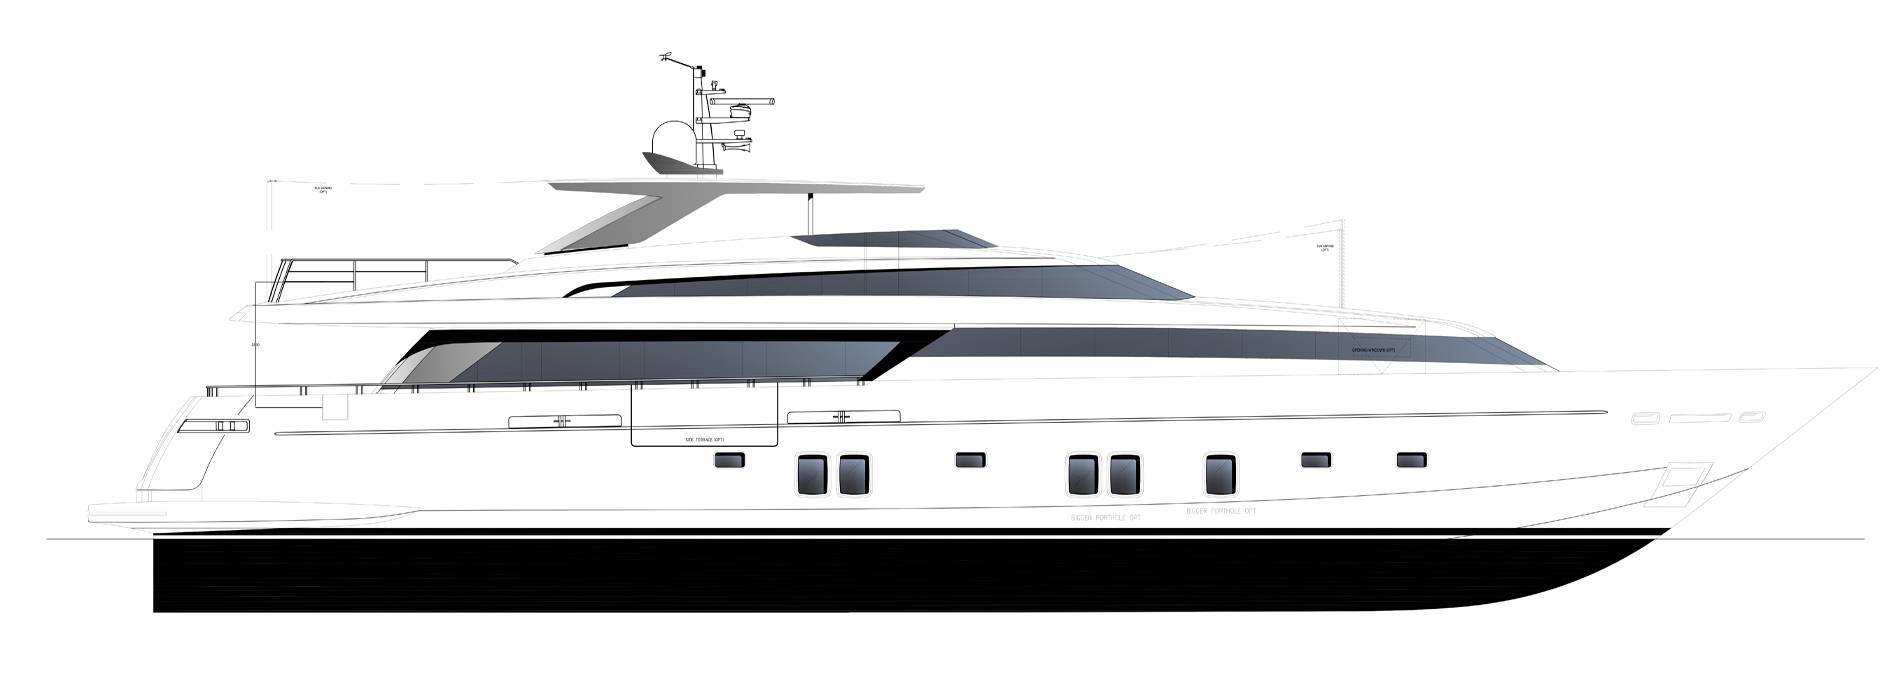 Sanlorenzo Yachts SL118-628 Perfil